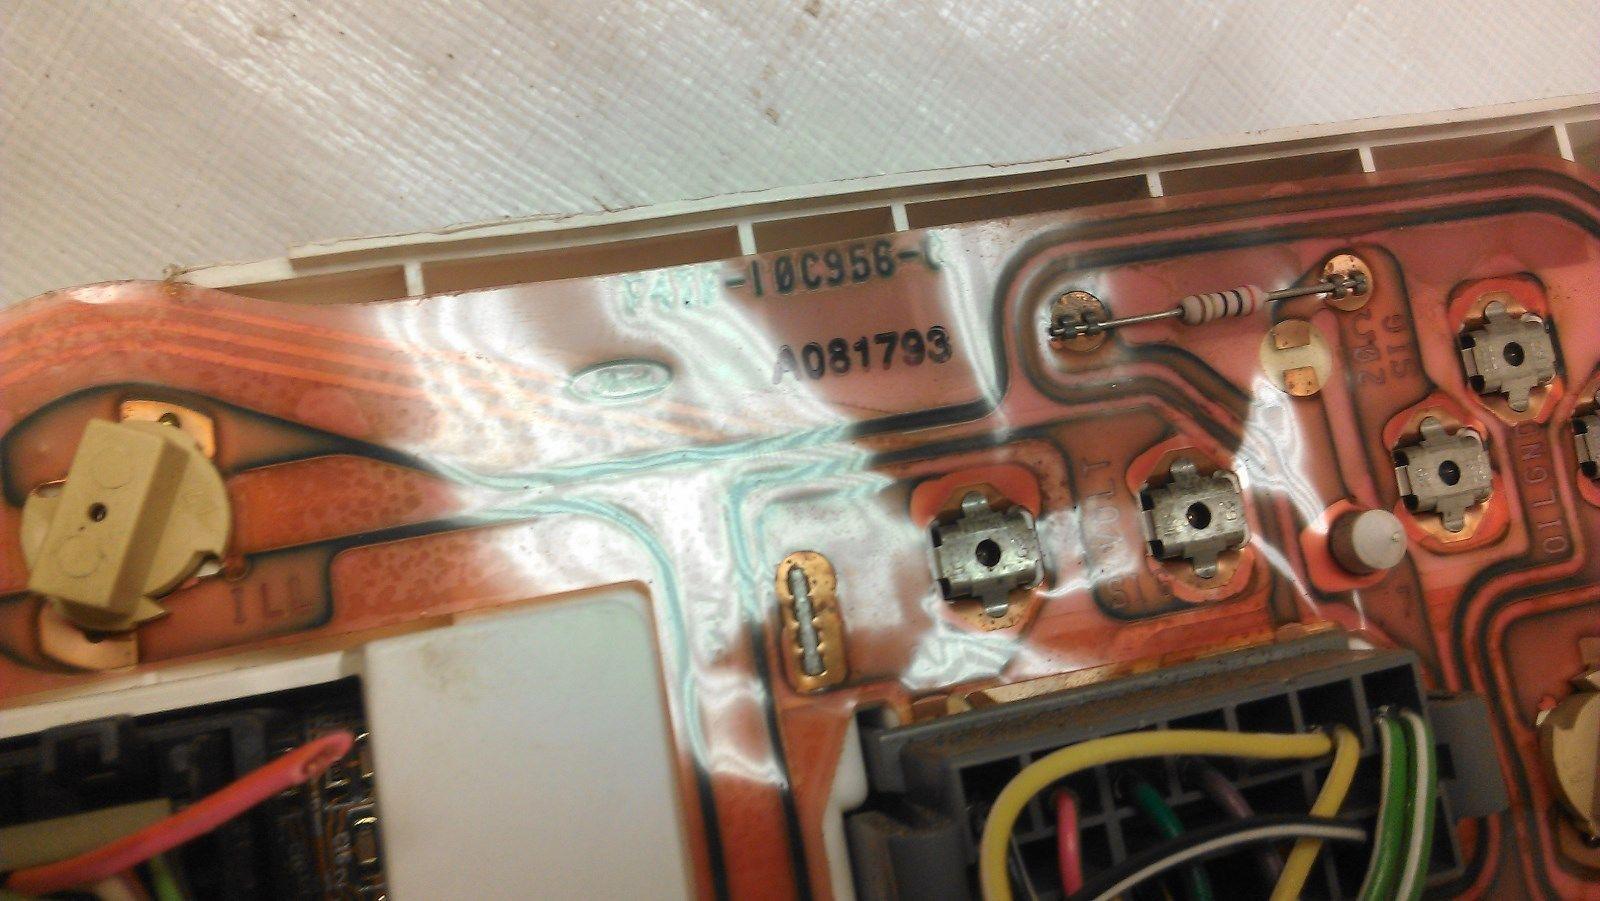 1980 1986 1980 1986 Ford Bronco Truck Gauge Cluster Printed Circuit